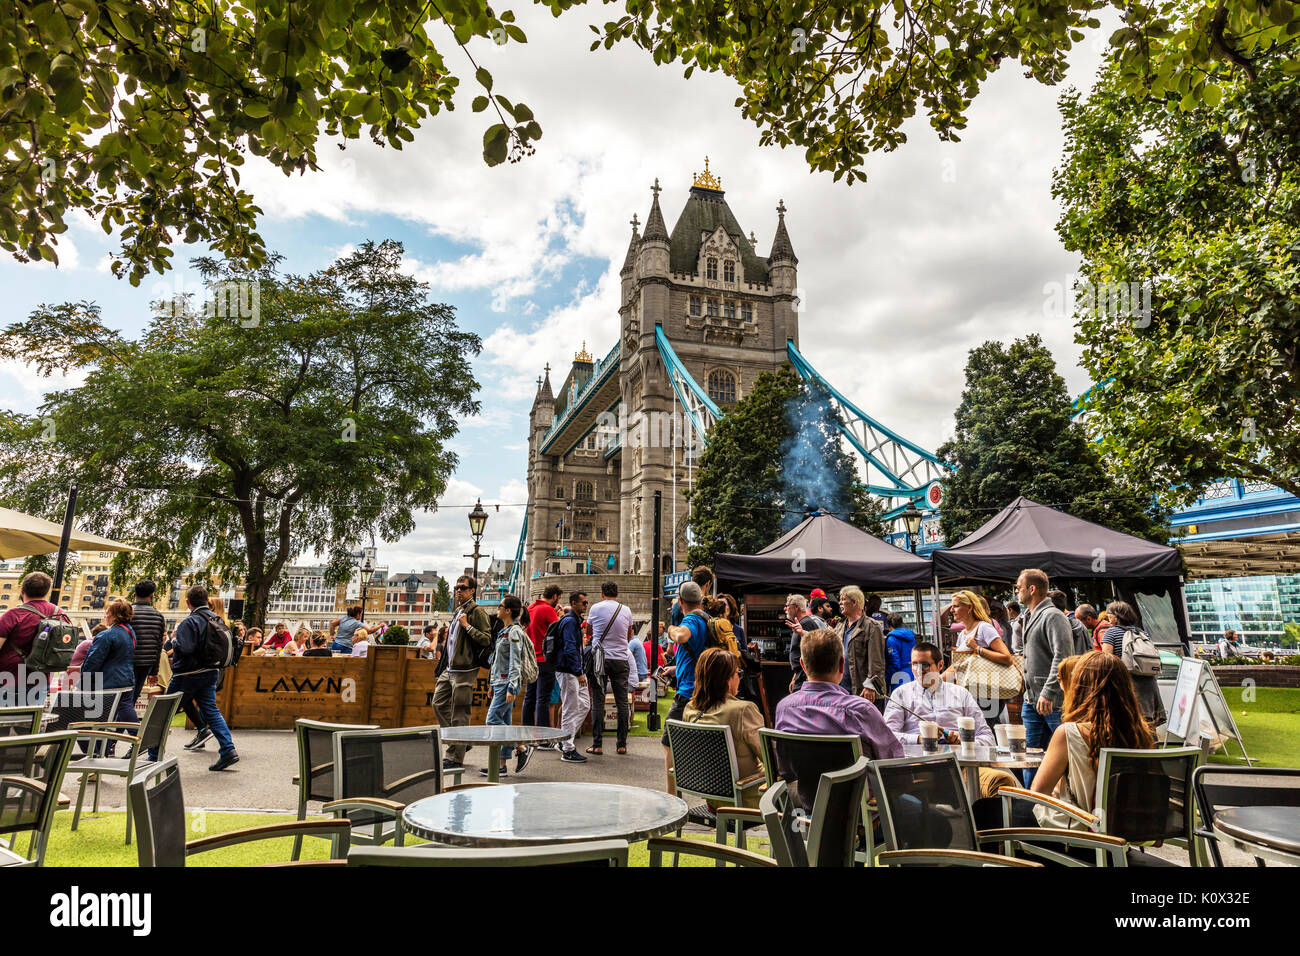 Tower bridge London, London Tower Bridge, eating outside in London, London UK England, London city UK, Tower bridge, Tower bridge London city UK - Stock Image